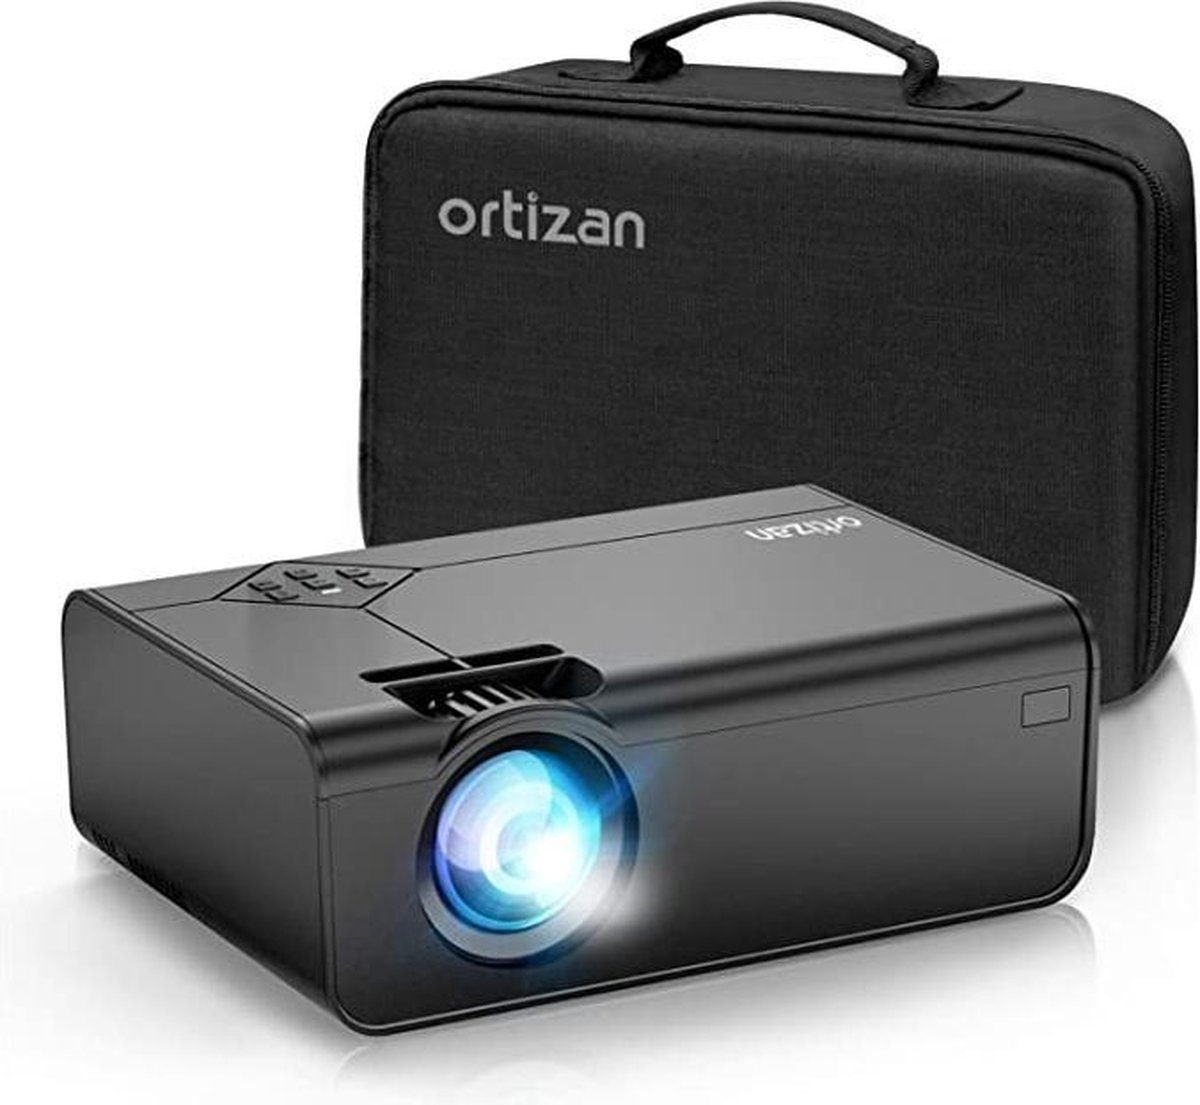 """Mini Beamer - Ozan Mini beamer, draagbare home theater beamer met 1080p Full HD, 5000 lumen en 180"""